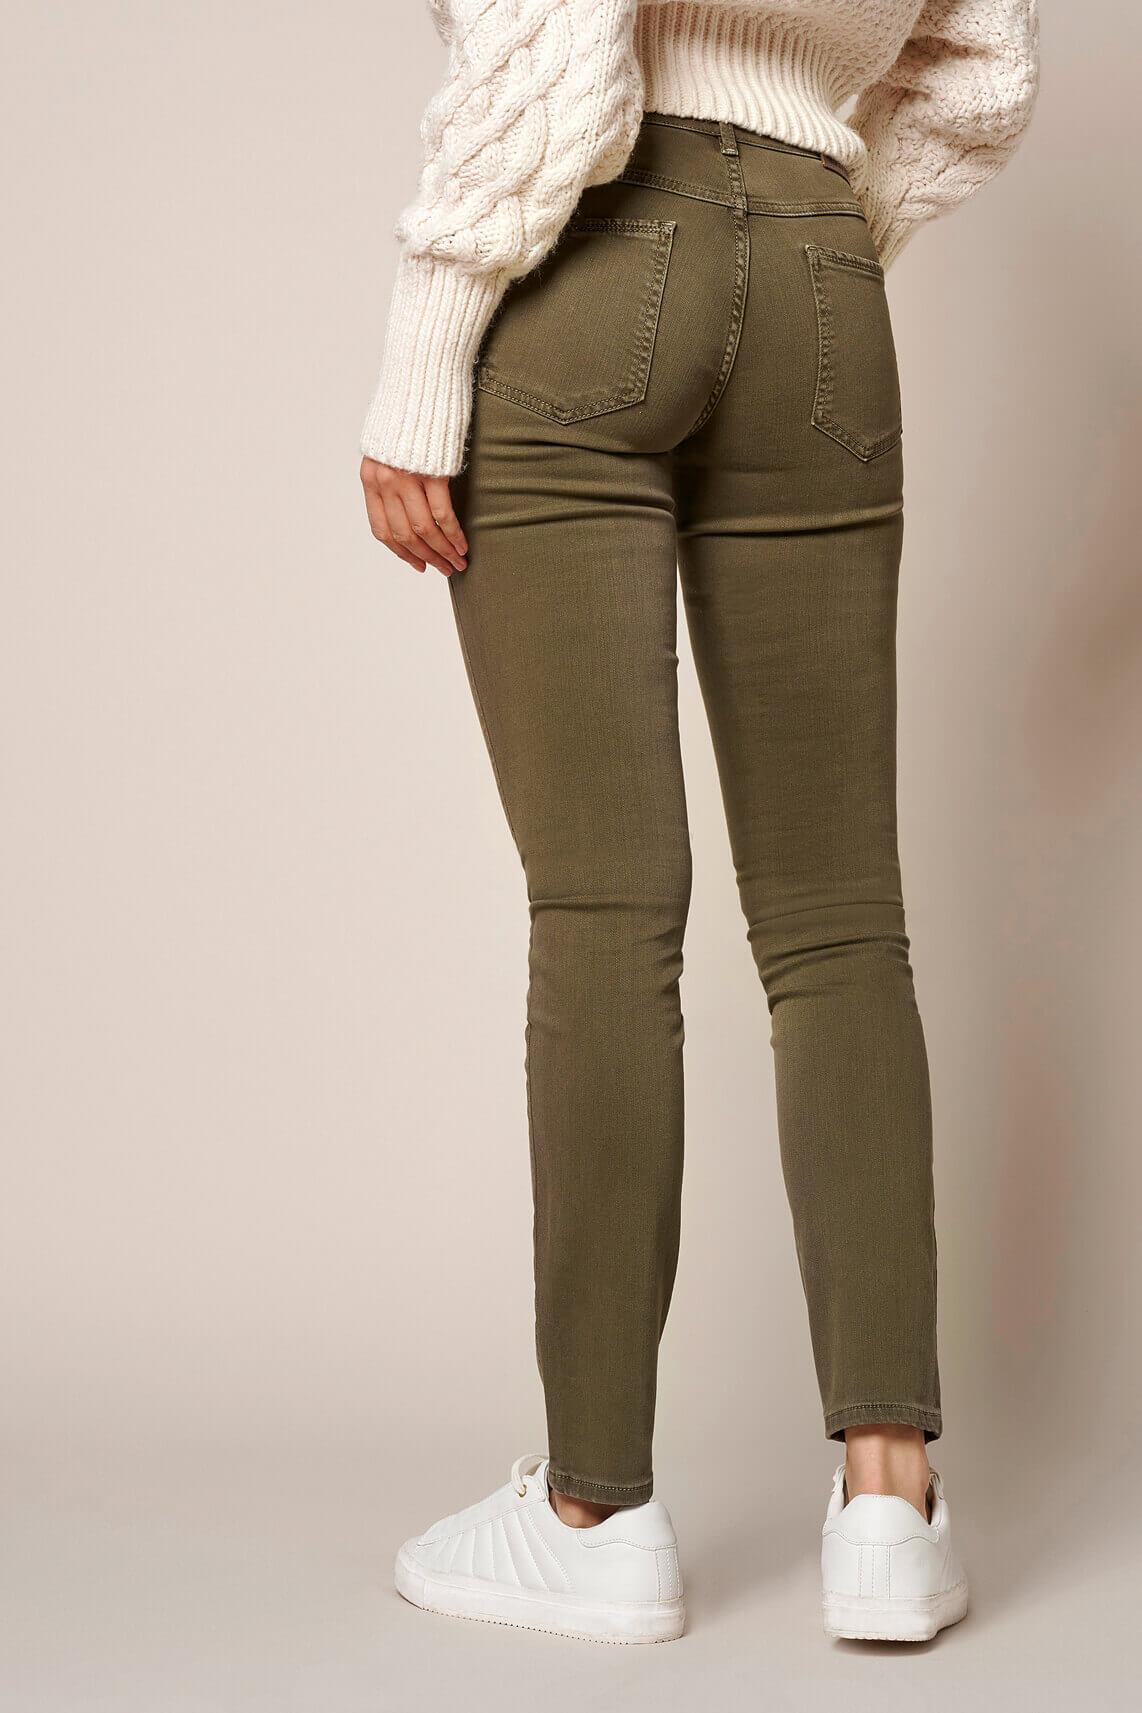 Rosner Dames L30 Antonia broek groen